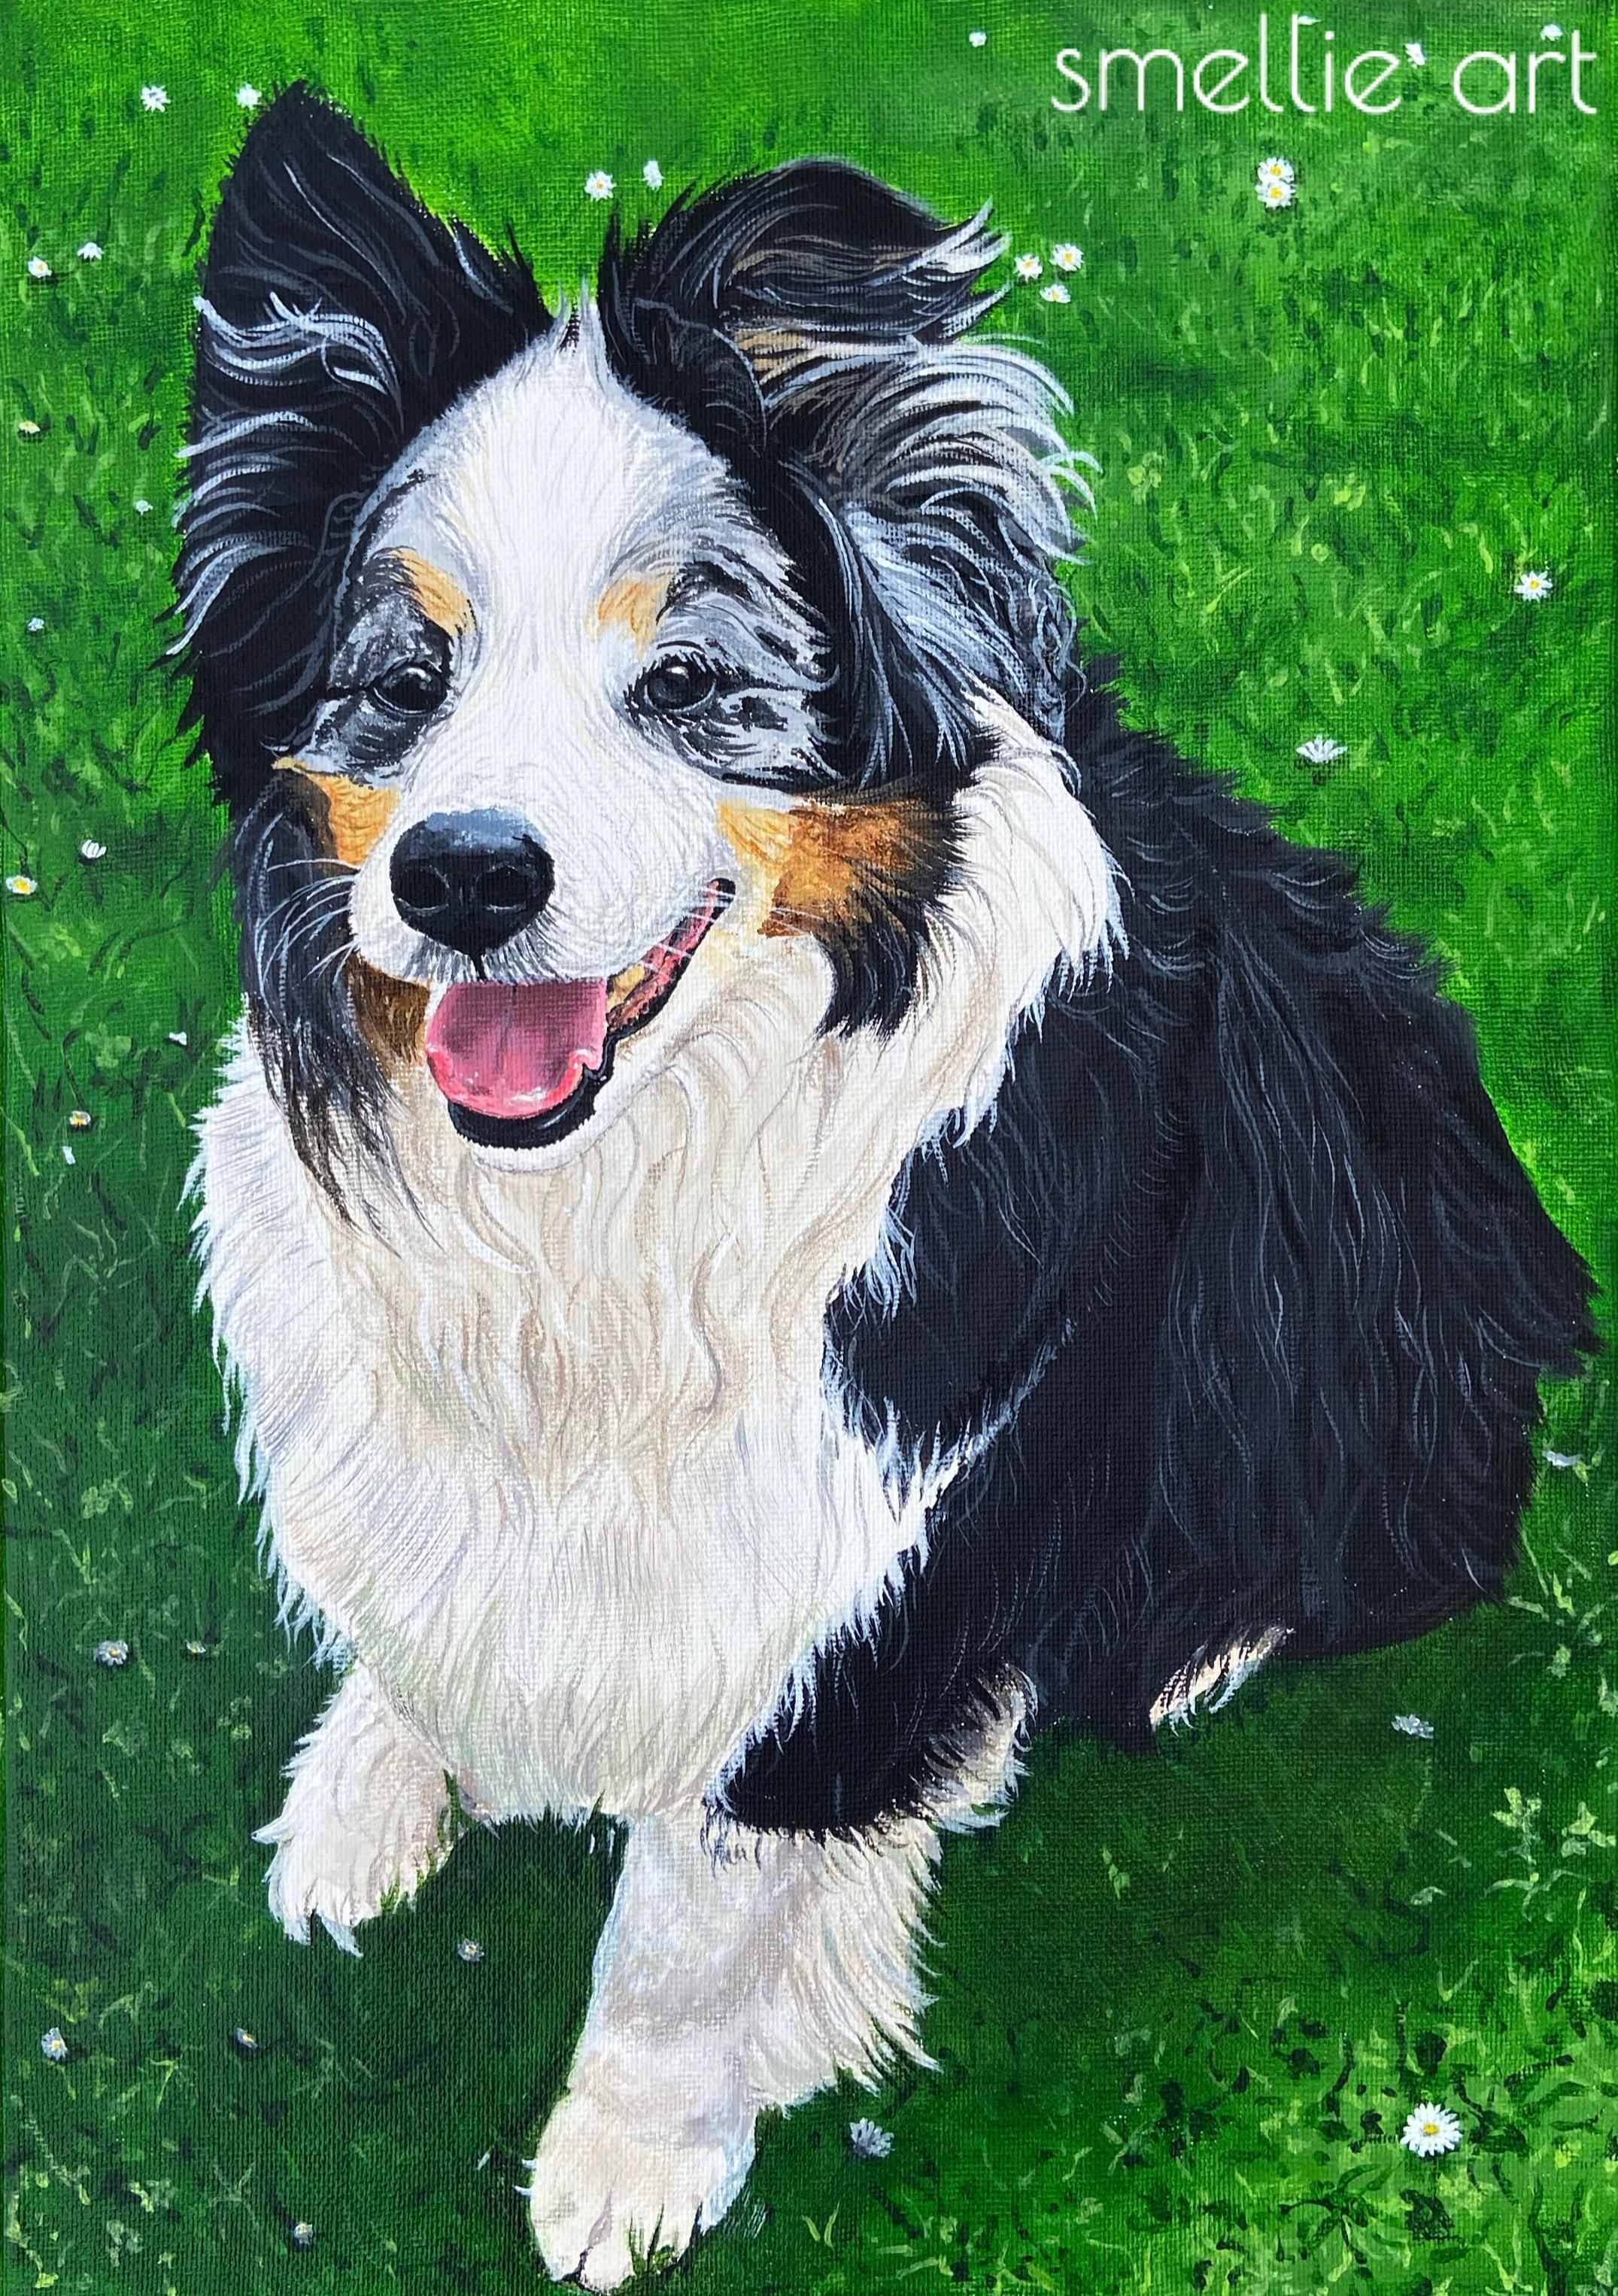 Sheepdog Painting.JPG